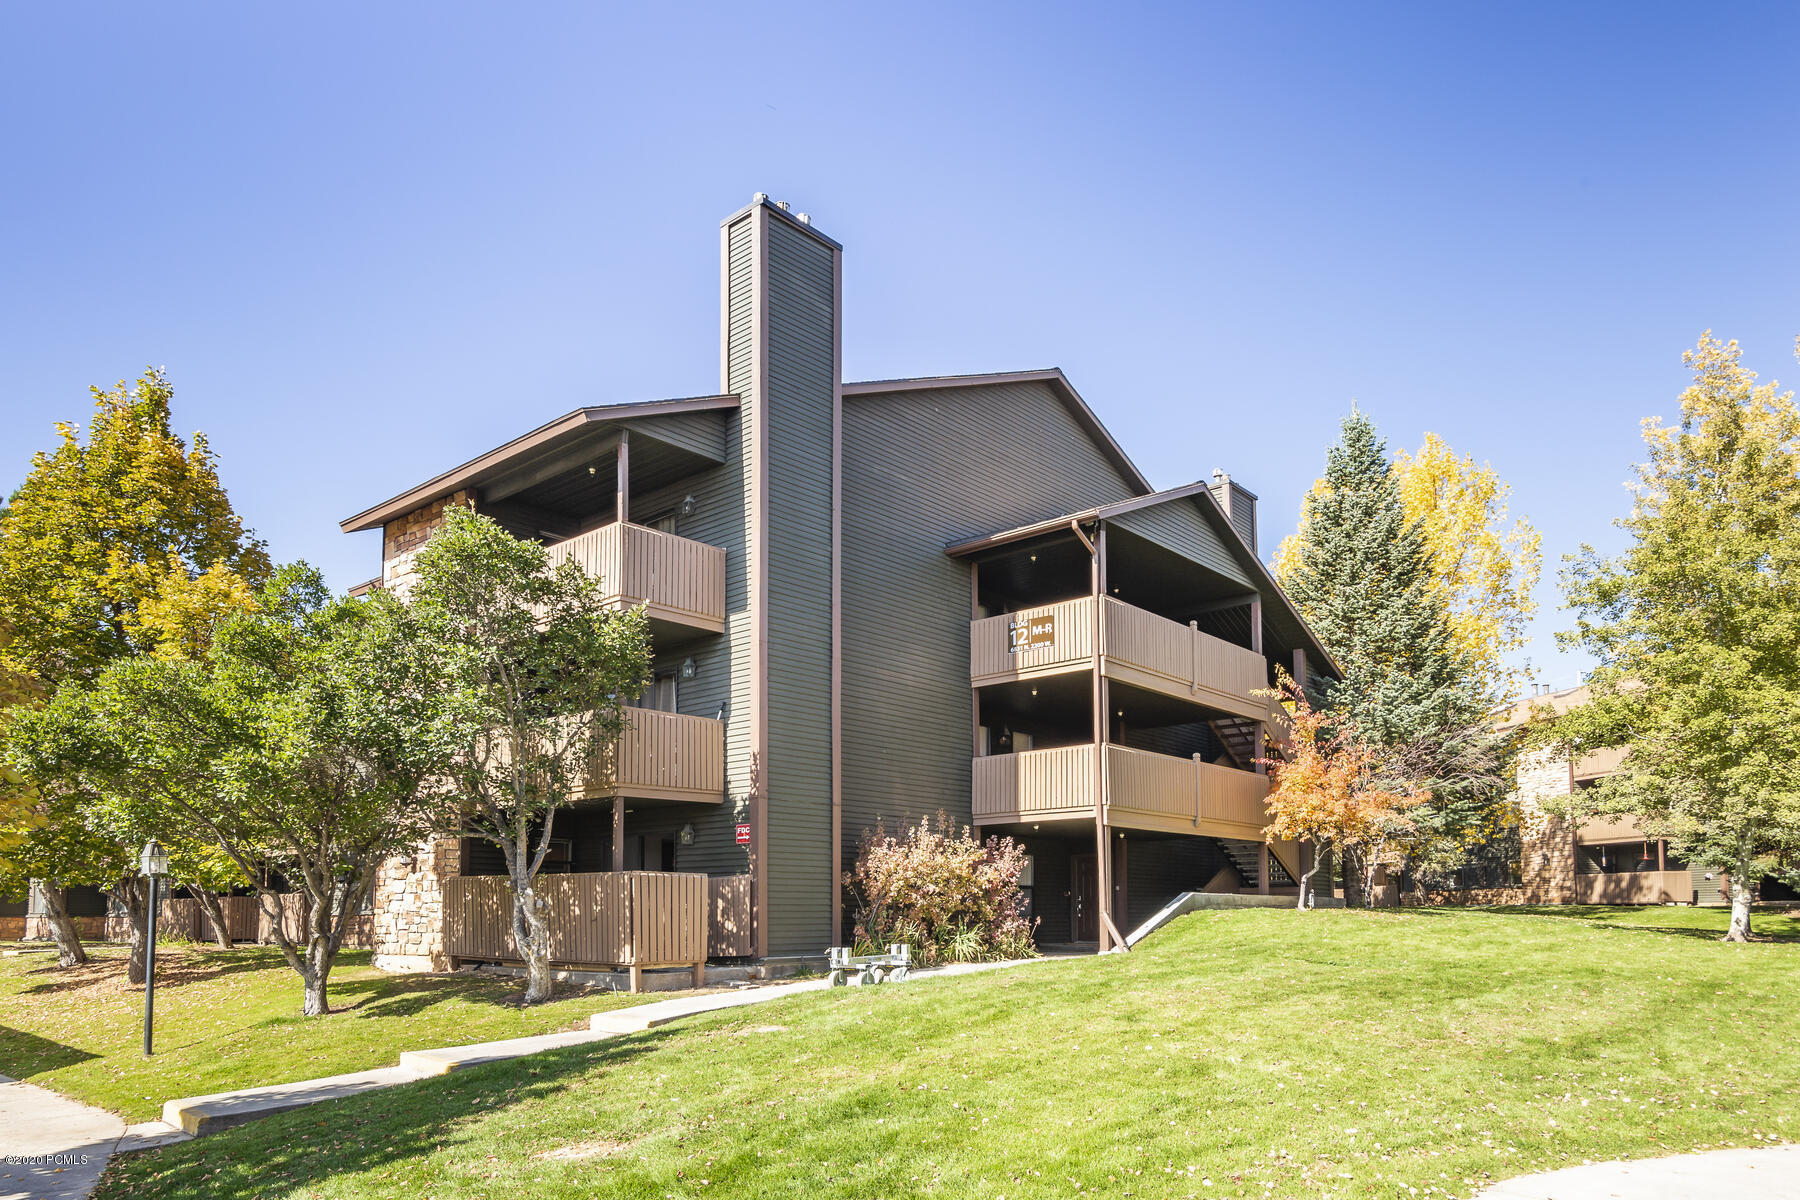 6831 2200 W, Park City, Utah 84098, 1 Bedroom Bedrooms, ,1 BathroomBathrooms,Condominium,For Sale,2200 W,12003963